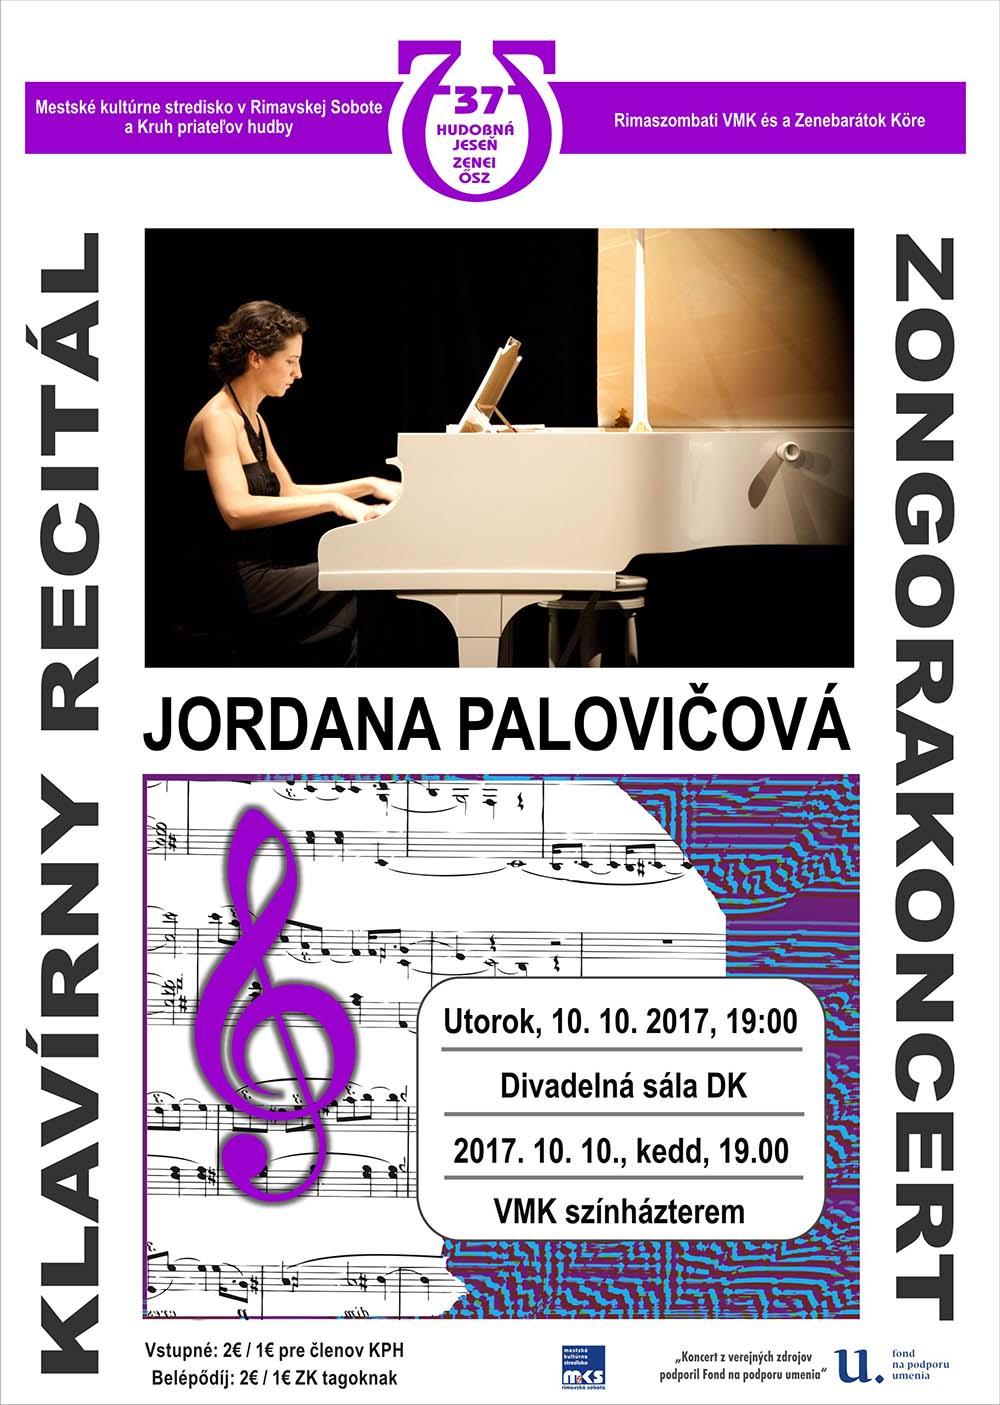 Klavírny recitál Jordany Palovičovej @ Divadelná sála Domu kultúry Rimavská Sobota | Slovensko